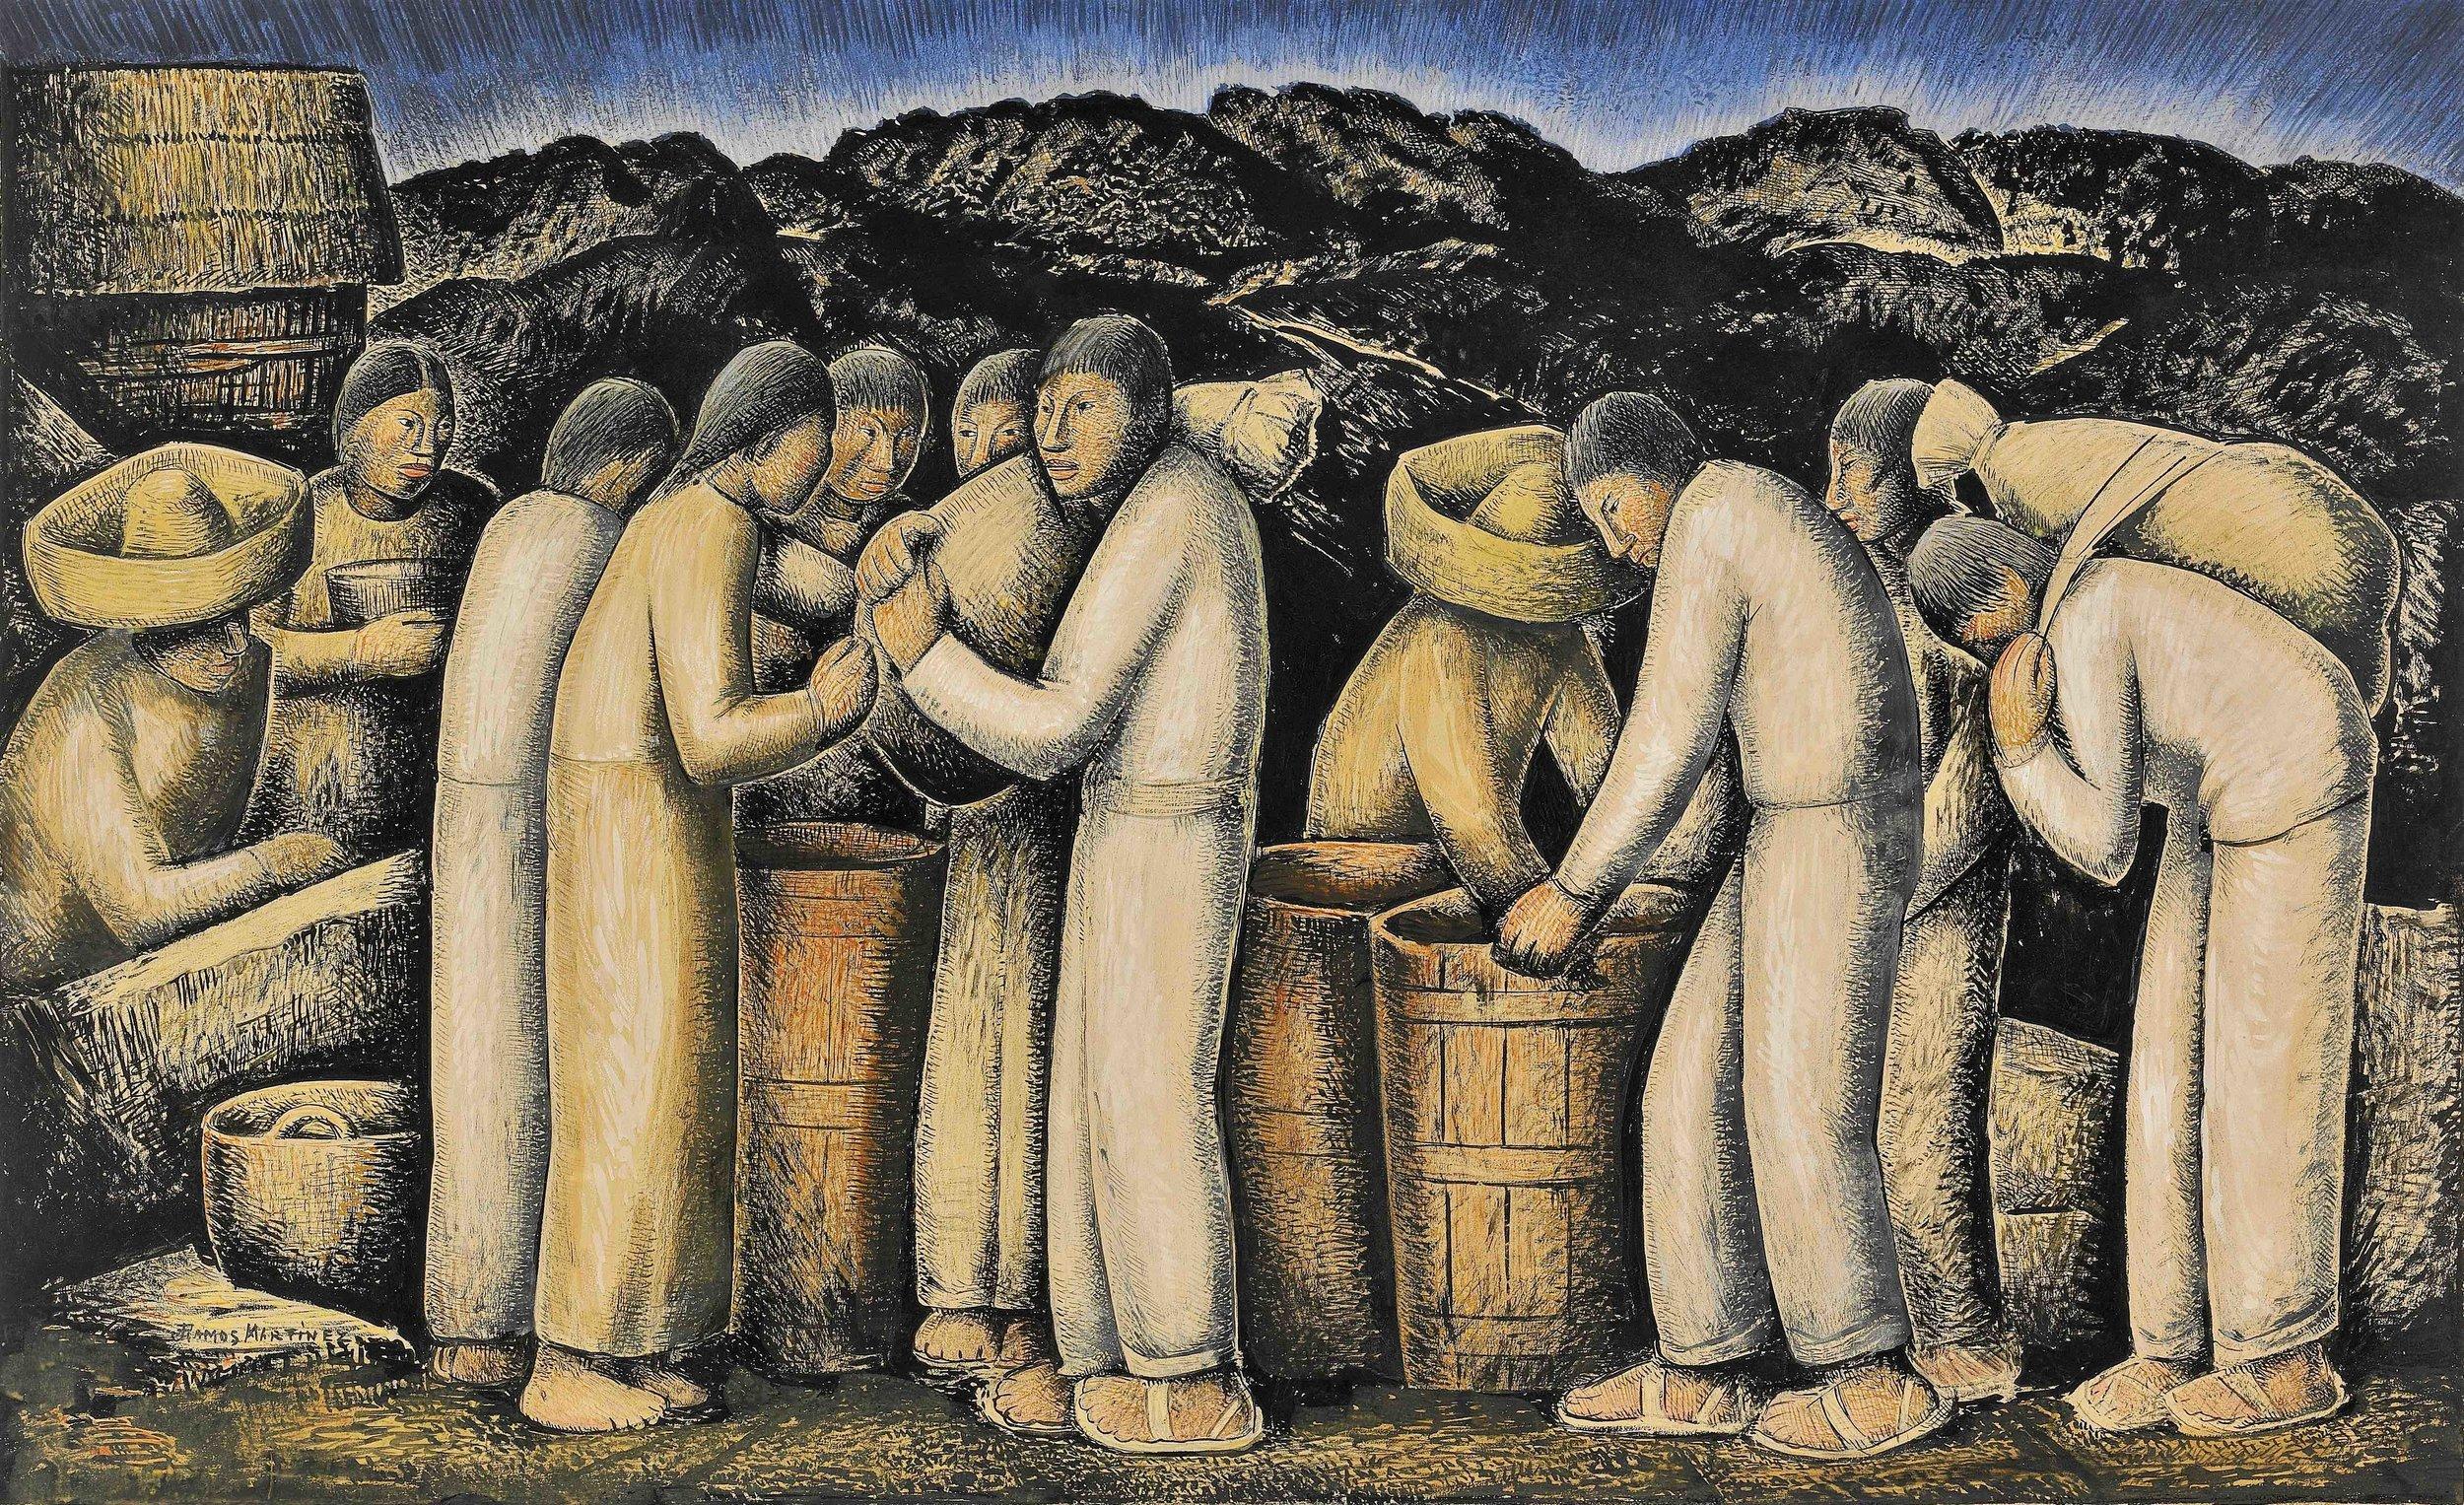 Los Pulqueros / Making Pulque  ca. 1935 tempera on paper / temple sobre papel 14.3 x 23.5 inches; 36.2 x 59.7 centímetros